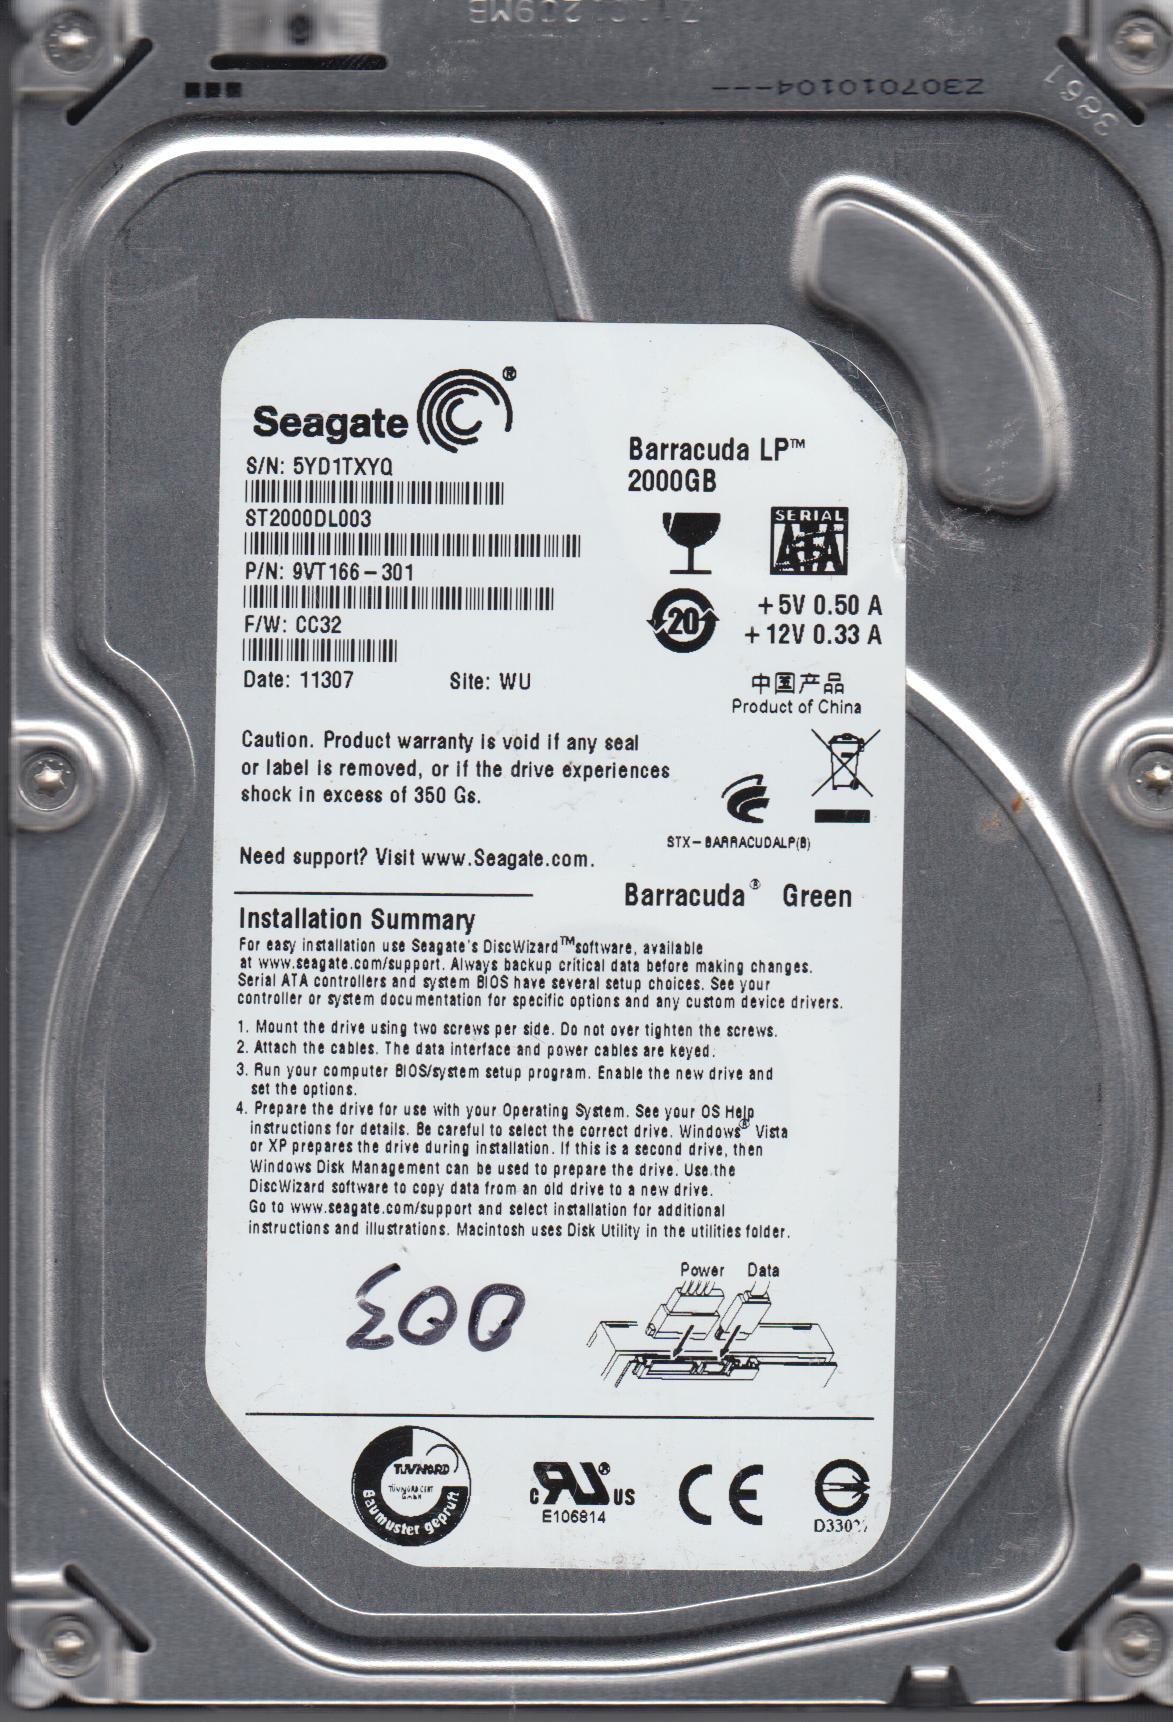 ST2000DL003, 5YD, WU, PN 9VT166-301, FW CC32, Seagate 2TB SATA 3.5 Hard Drive by Seagate